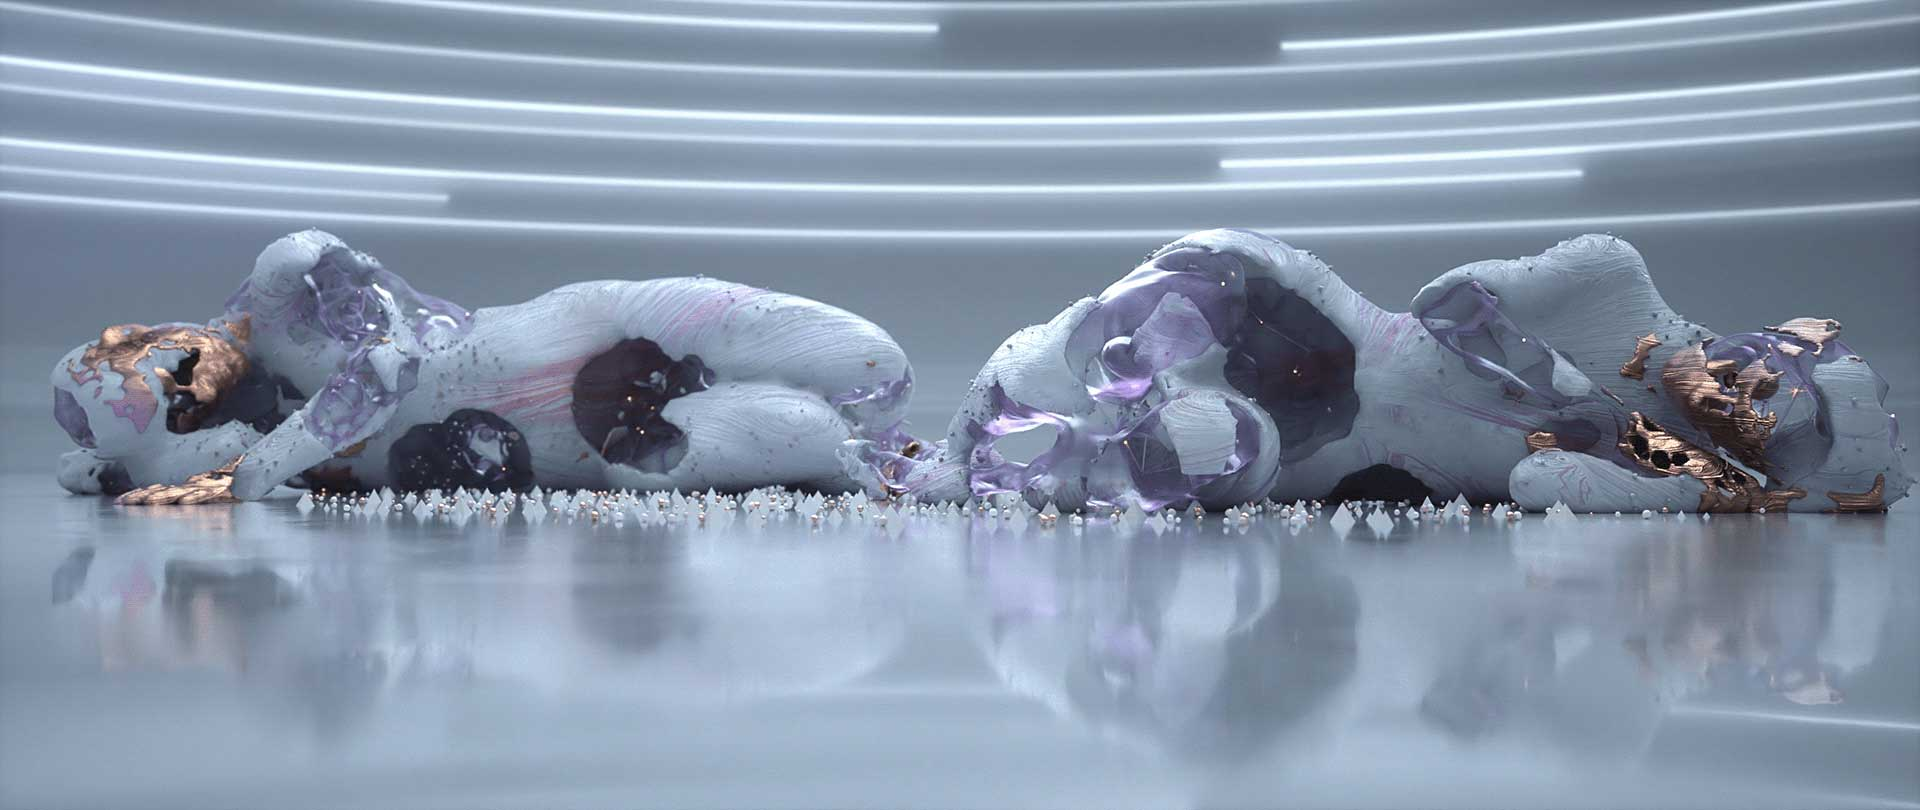 """Synced"" Short Film by Fabian Aerts | STASH MAGAZINE"